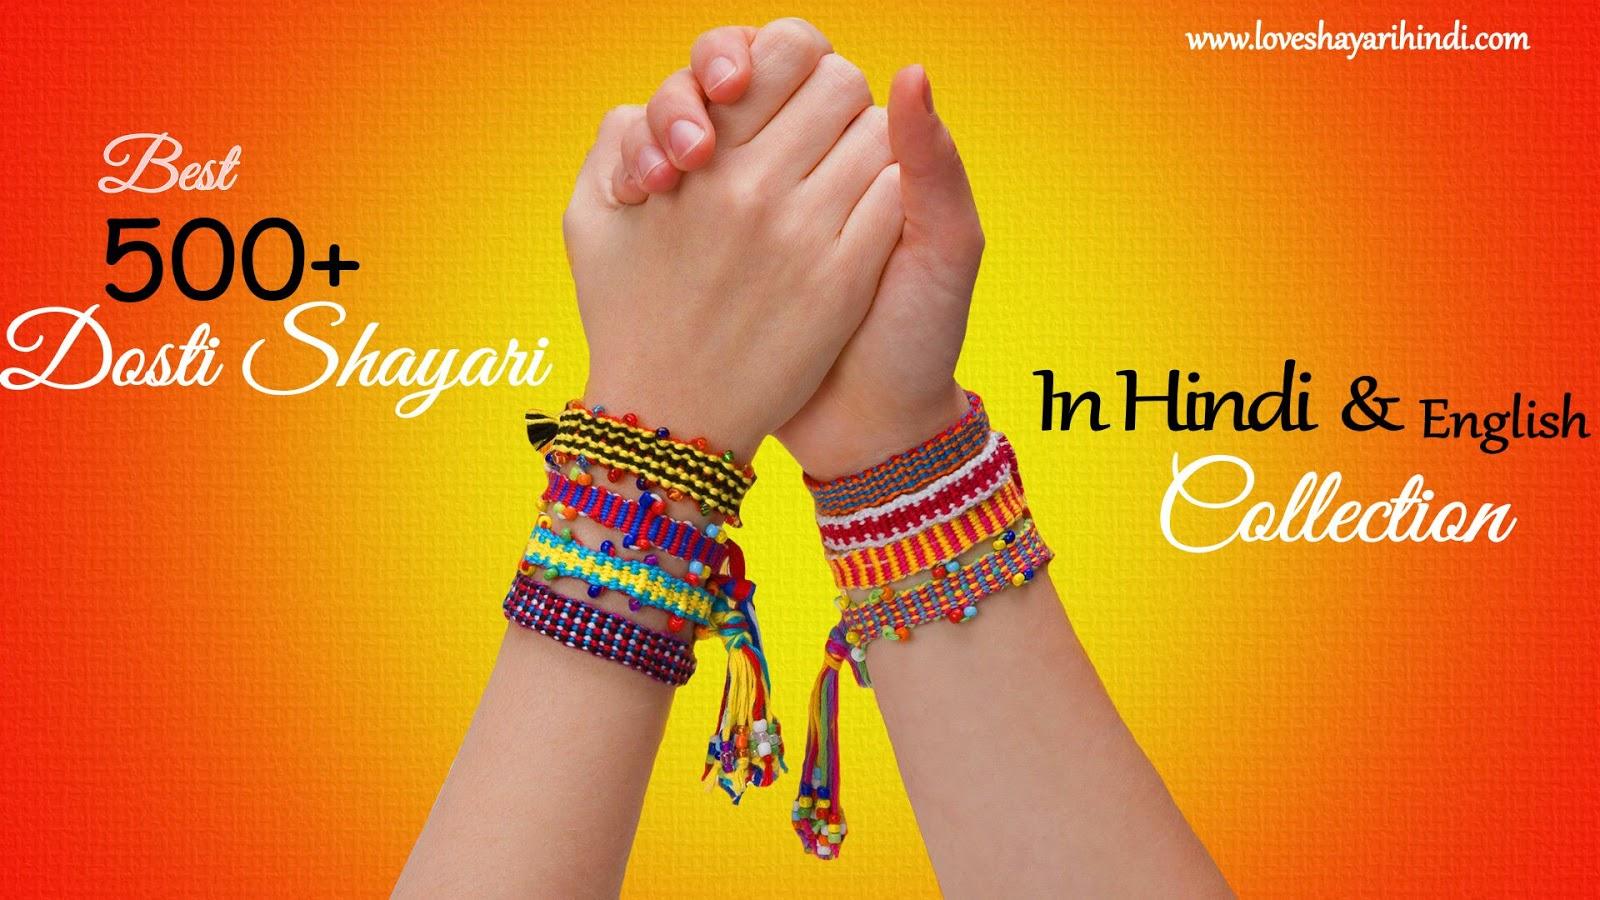 500+ Best Dosti Shayari in Hindi and English | हिंदी दोस्ती शायरी,